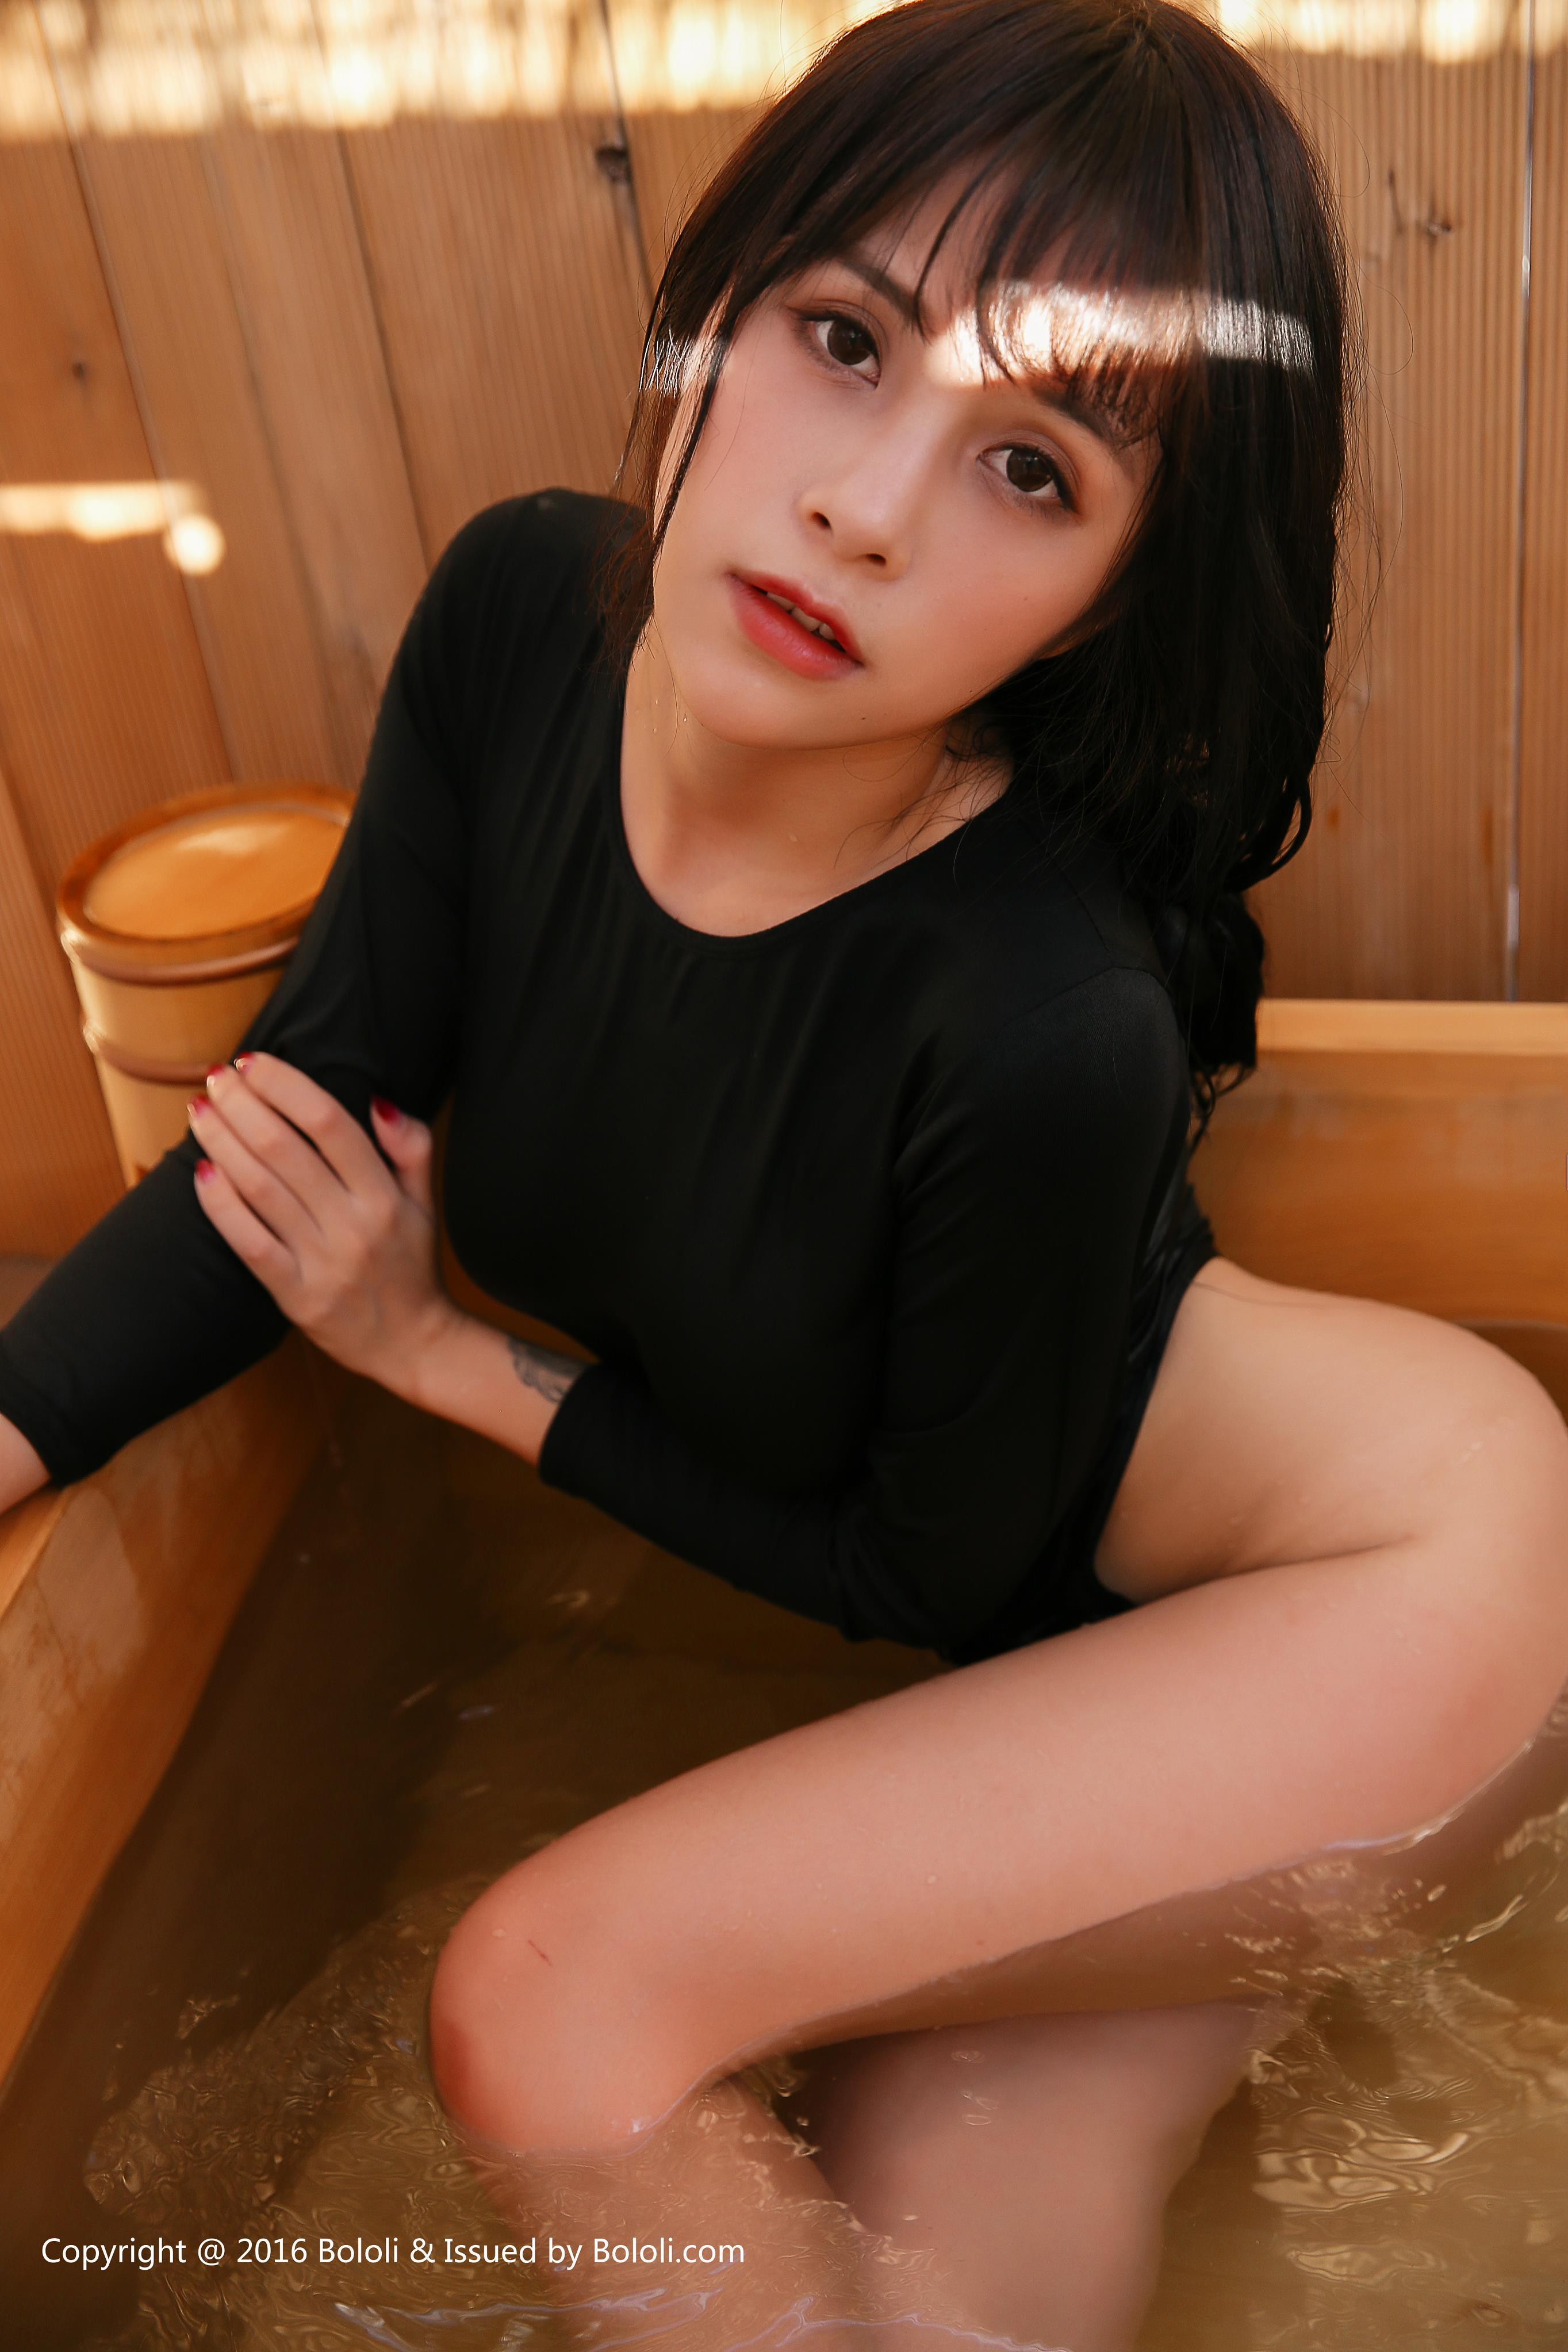 [BoLoli波萝社]BOL015 夏美酱 日本之旅 性感睡衣死库水私房写真集